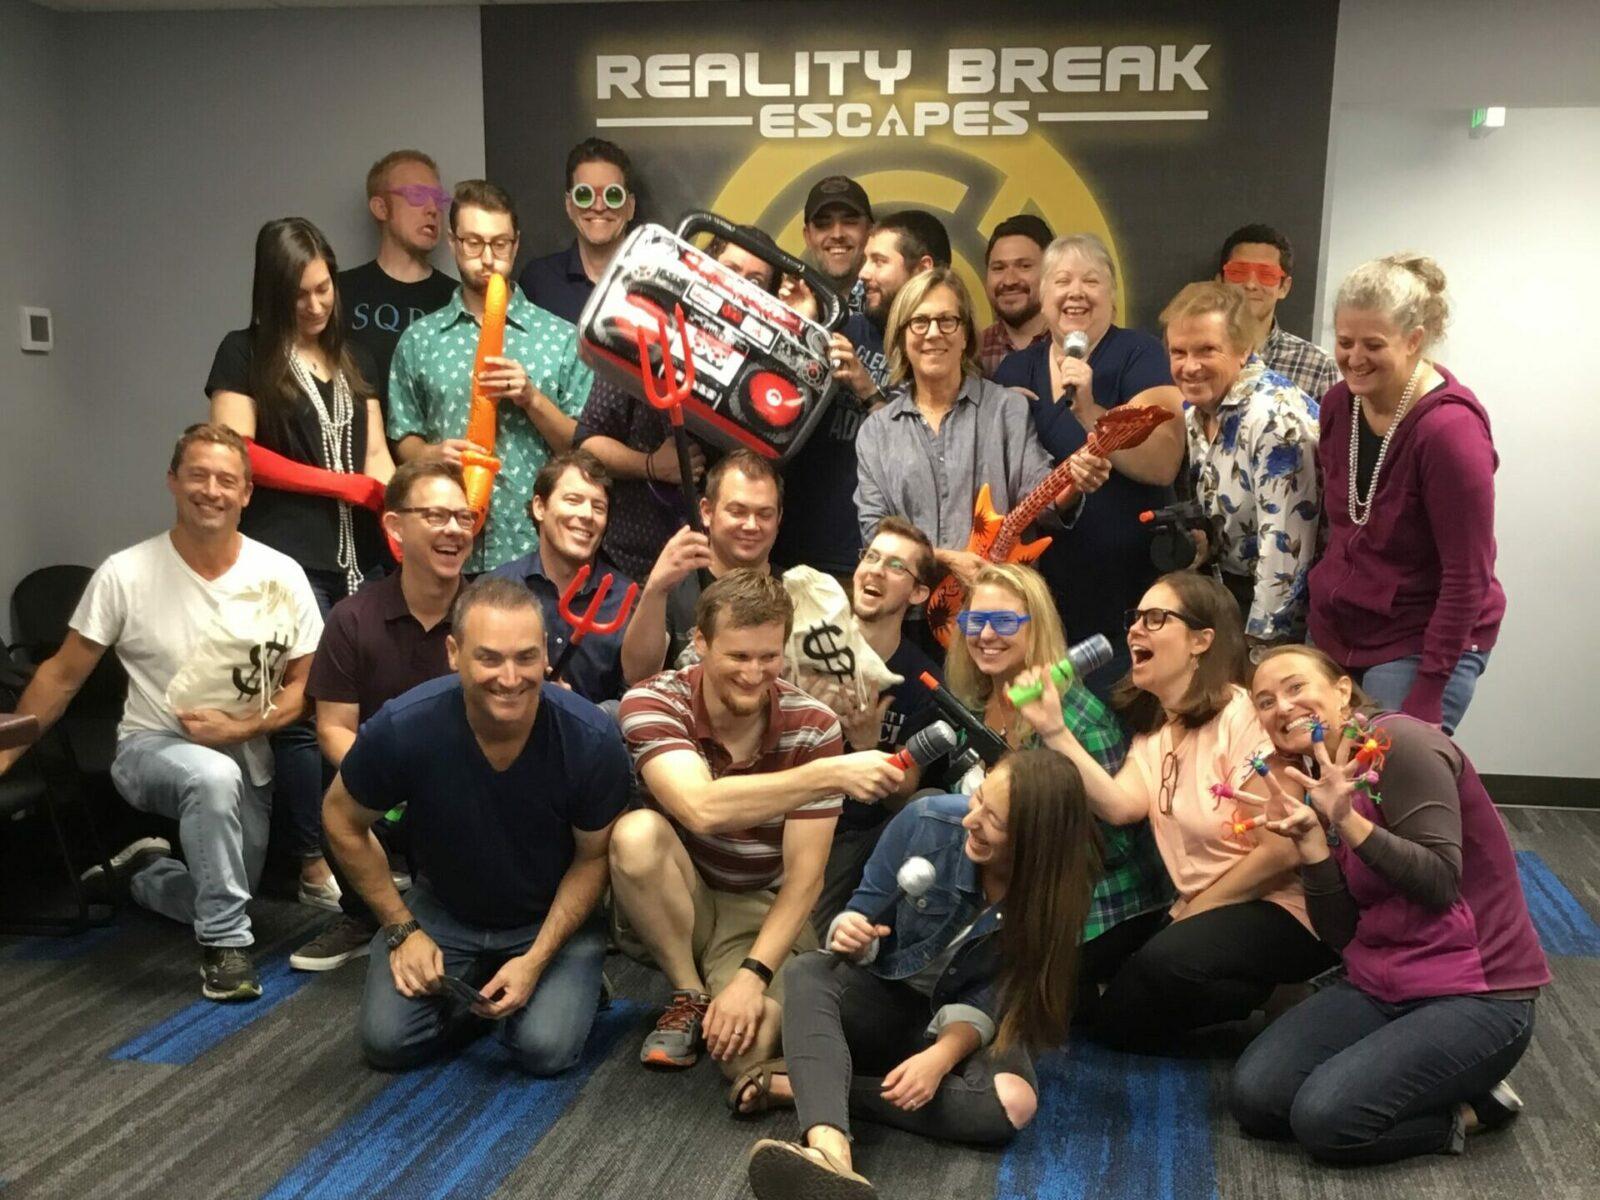 Reality Break Escapes